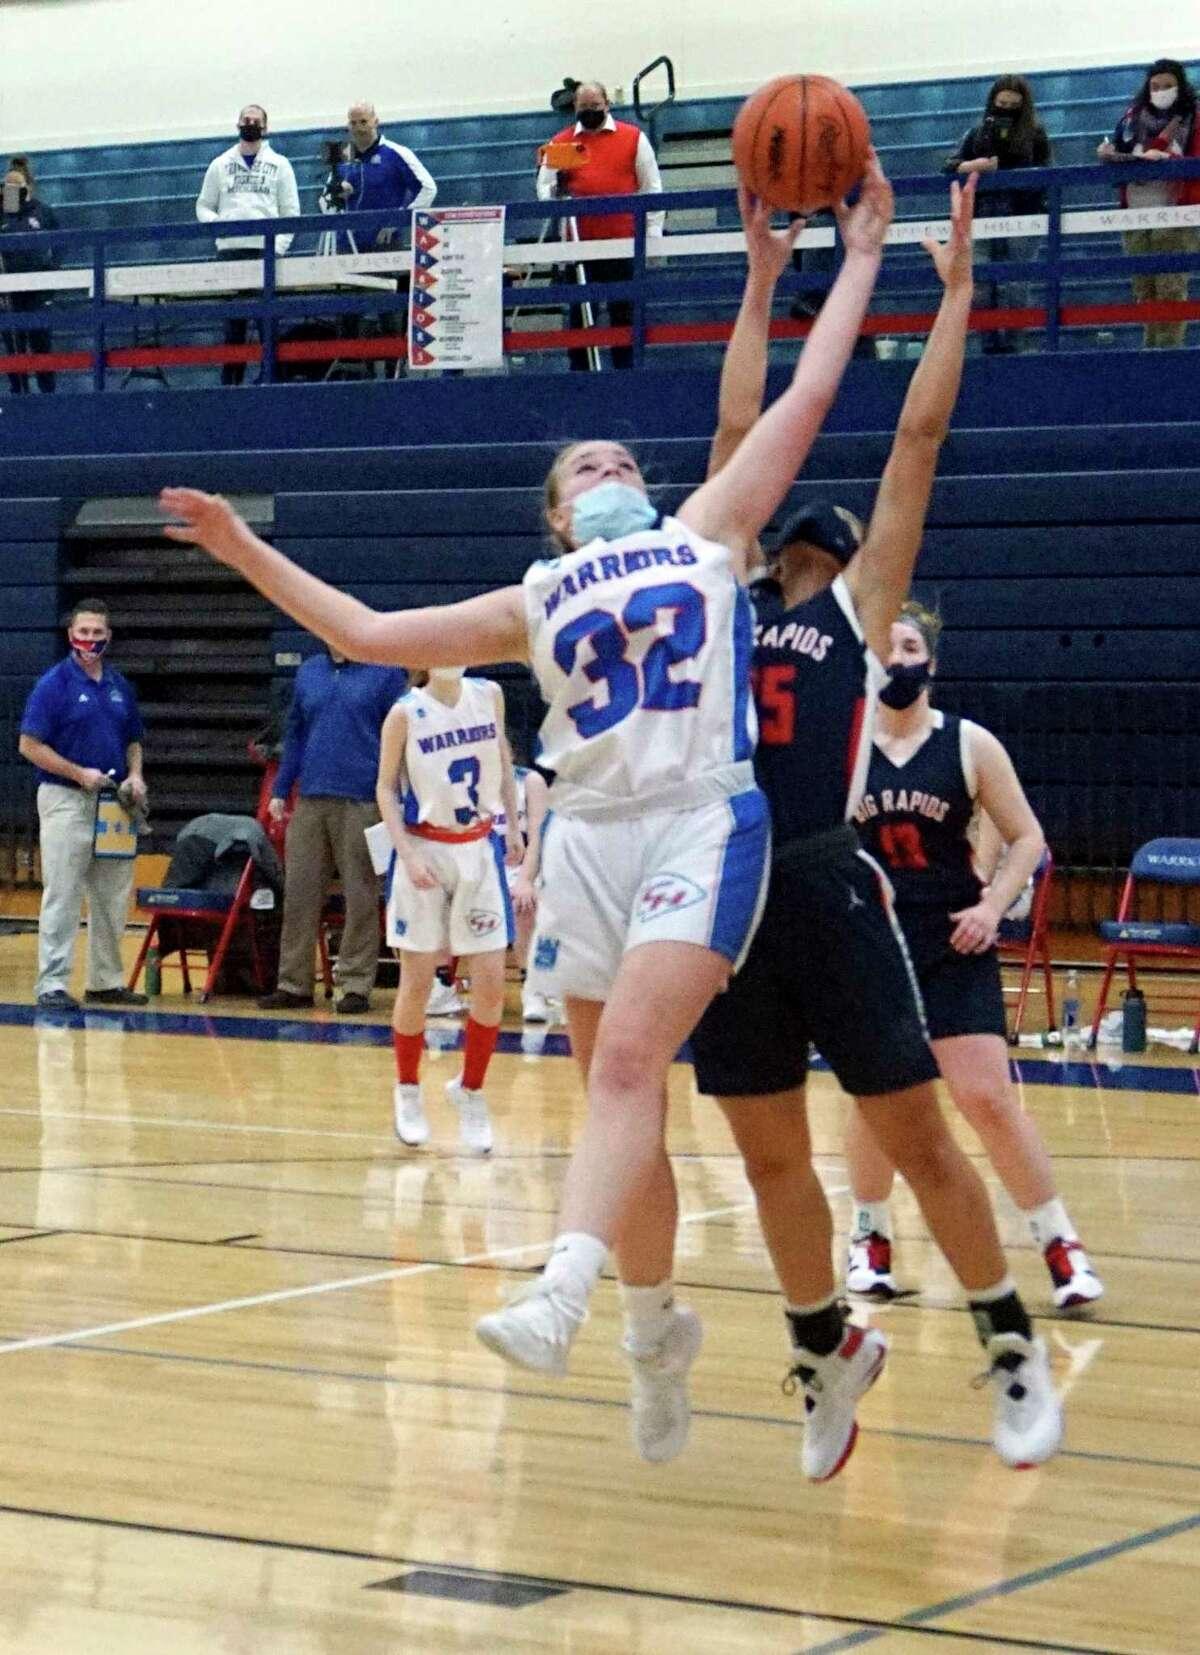 Chippewa Hills junior Madison Wrisley and Big Rapids freshman Marissa Warren go vertical for a rebound during a game on Friday night at Chippewa Hills High School. (Pioneer photo/Joe Judd)